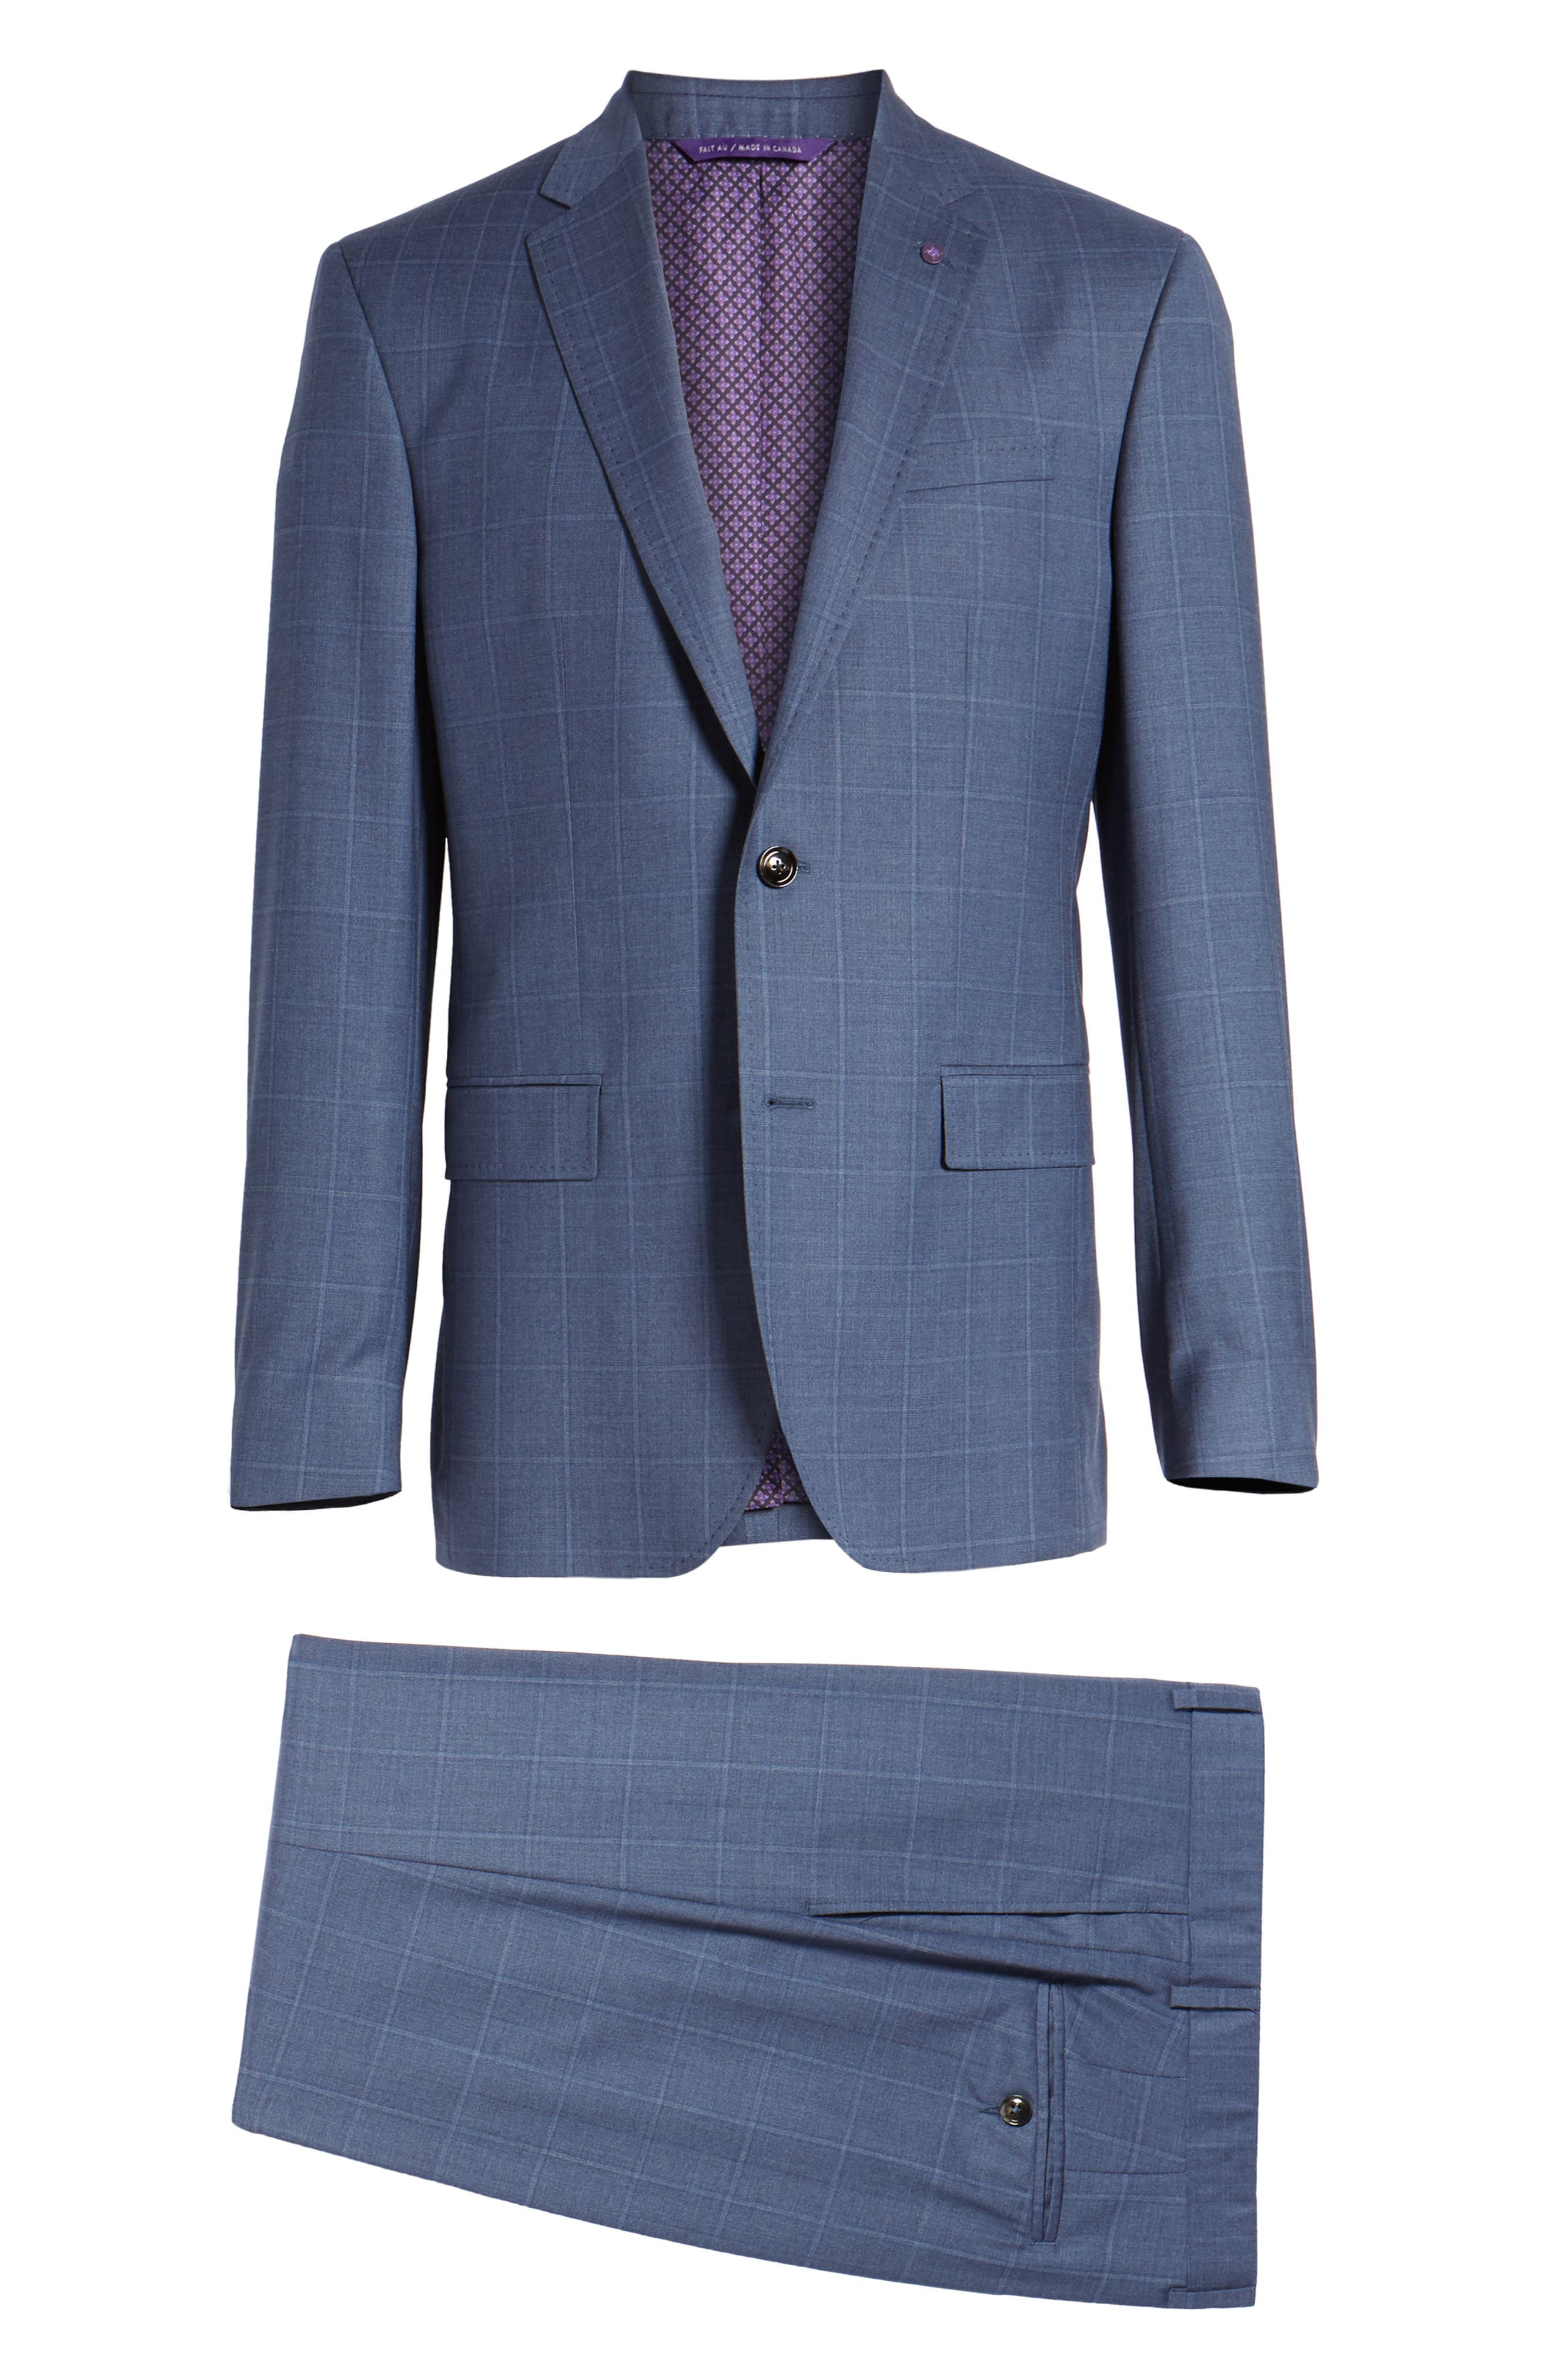 Jay Trim Fit Windowpane Wool Suit,                             Alternate thumbnail 8, color,                             420